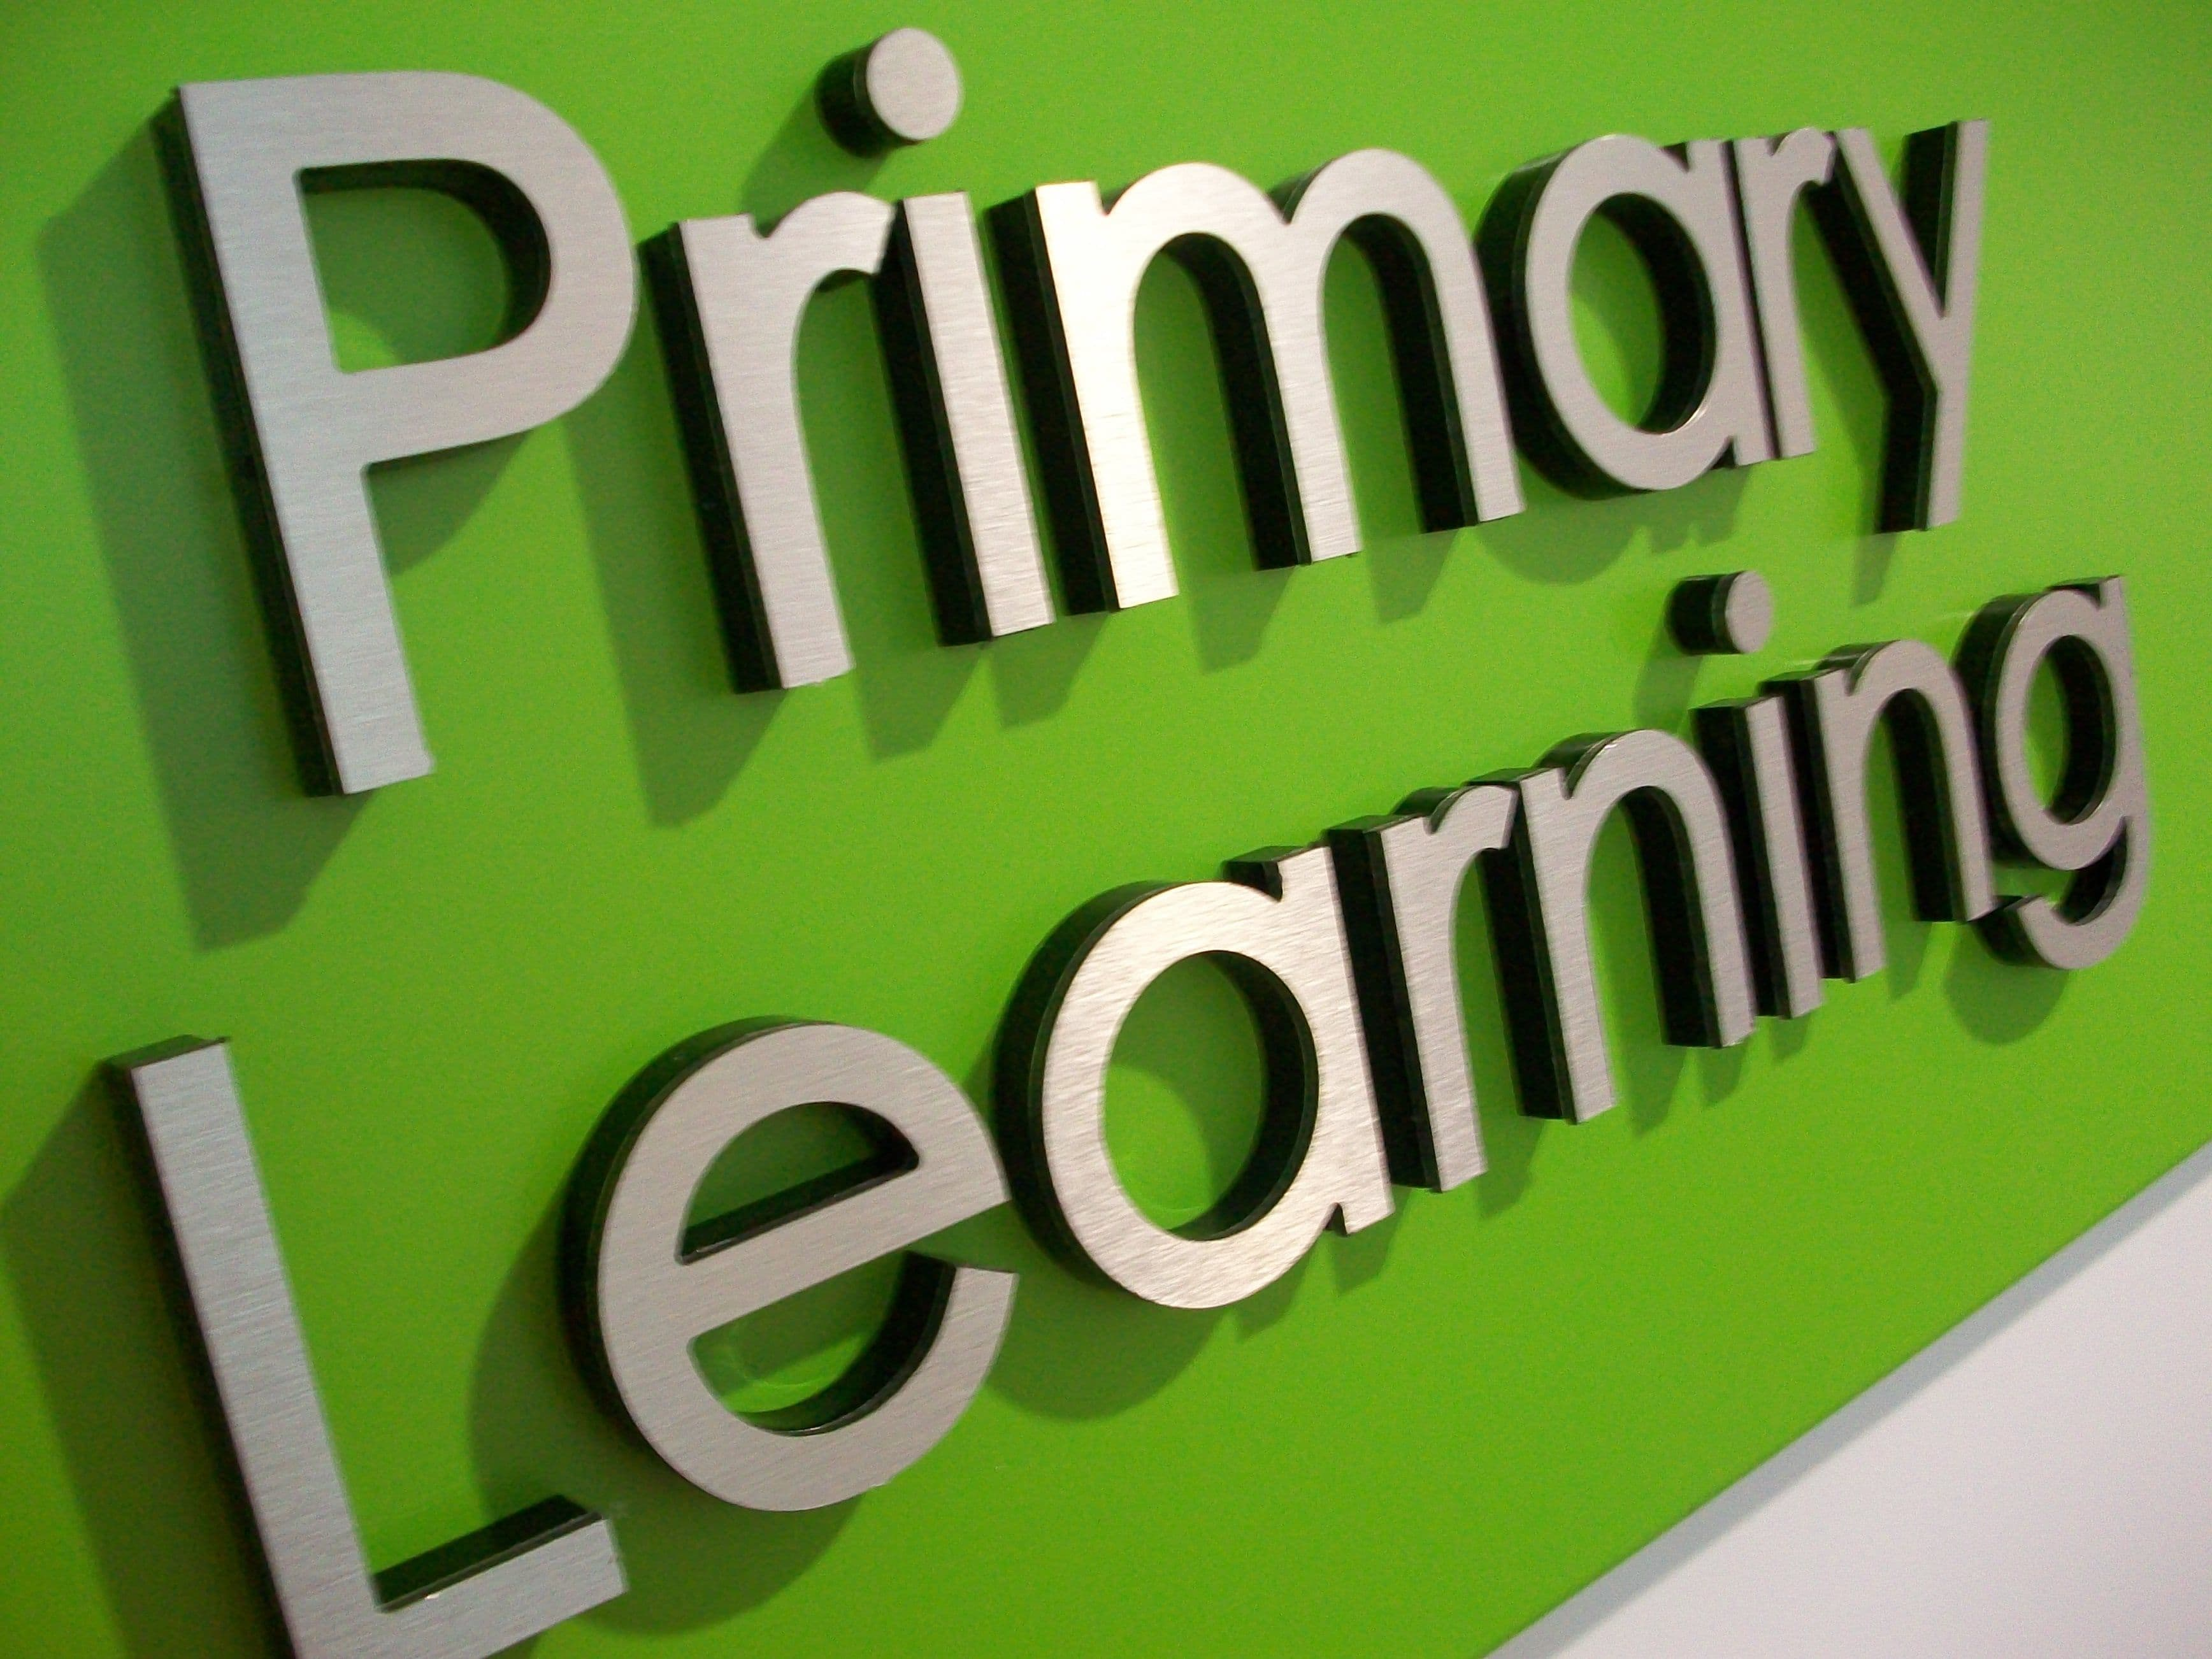 Primary school wayfinding signage